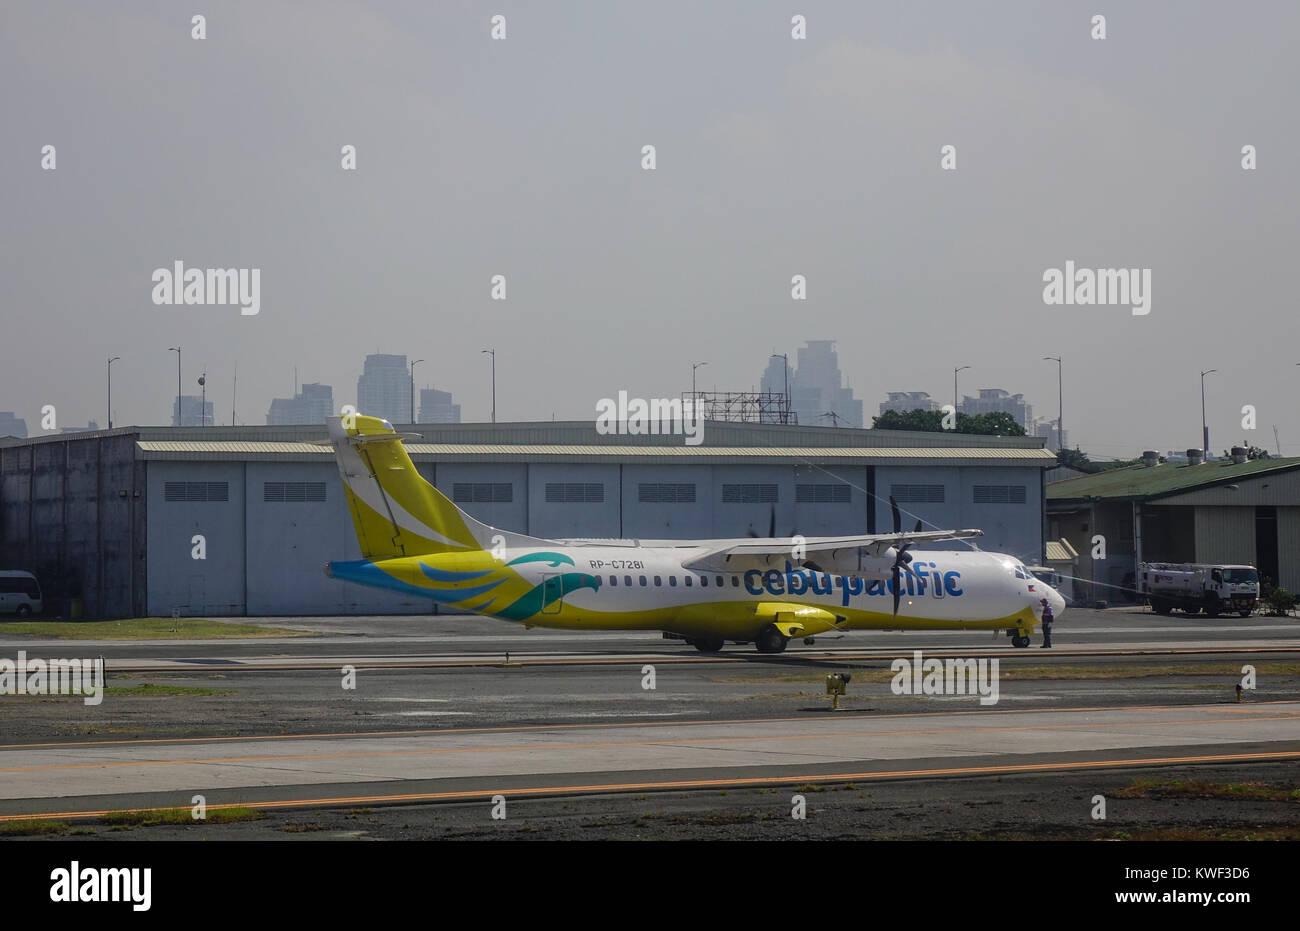 Manila, Philippines - Apr 12, 2017. A civil aircraft on runway at Ninoy Aquino Airport (NAIA) in Manila, Philippines. - Stock Image